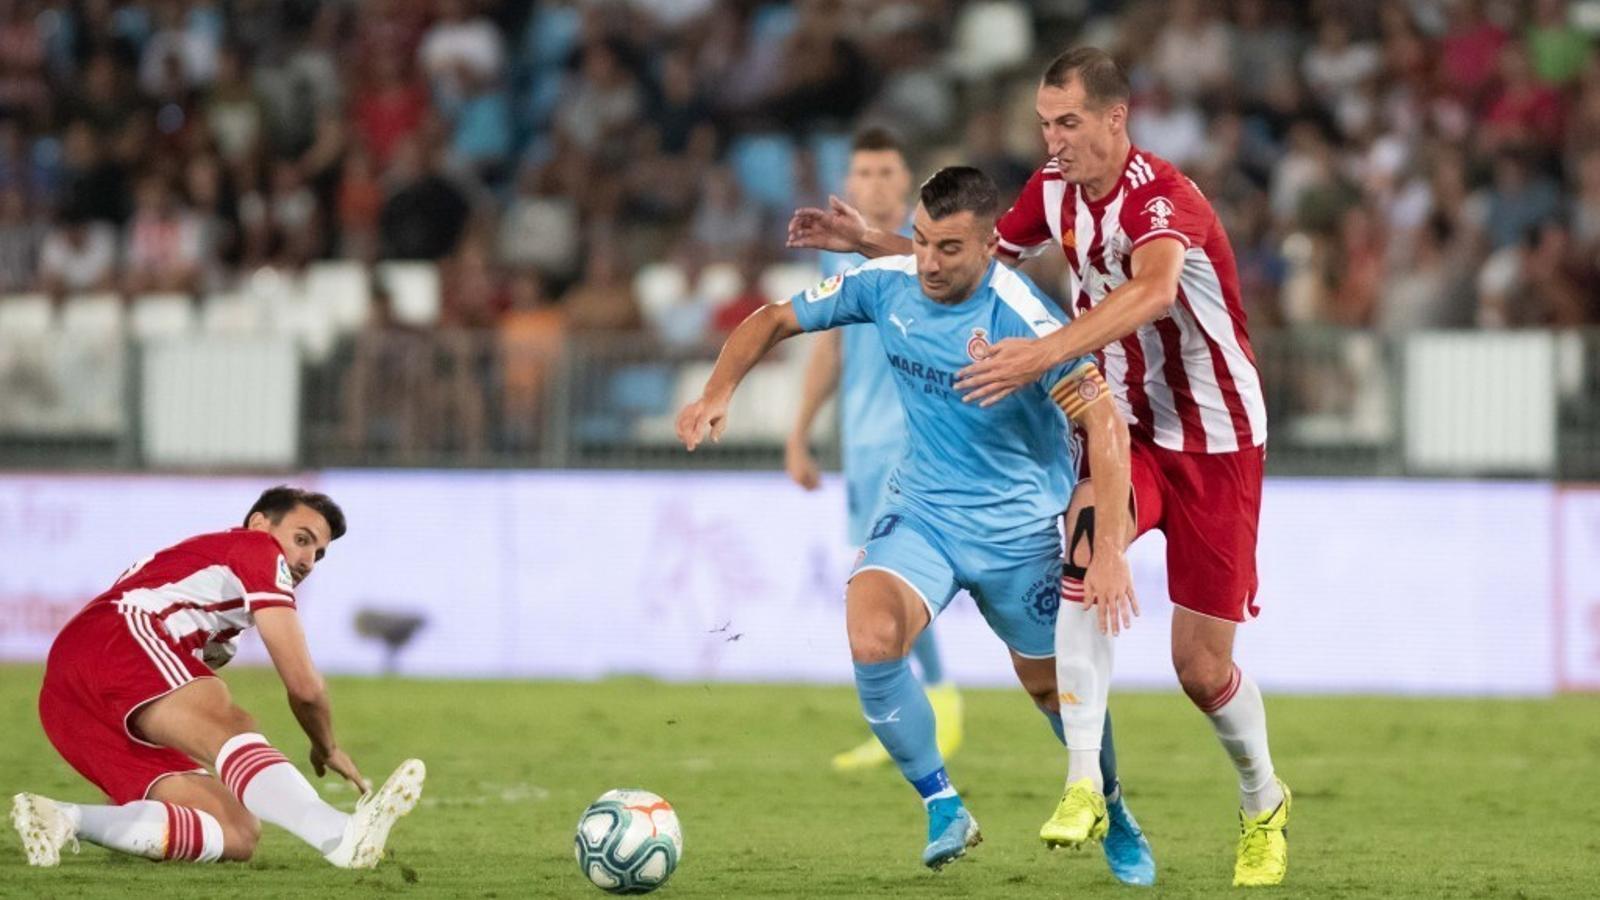 El Girona va caure en la seva darrera visita a Almeria (3-1) / GIRONA FC